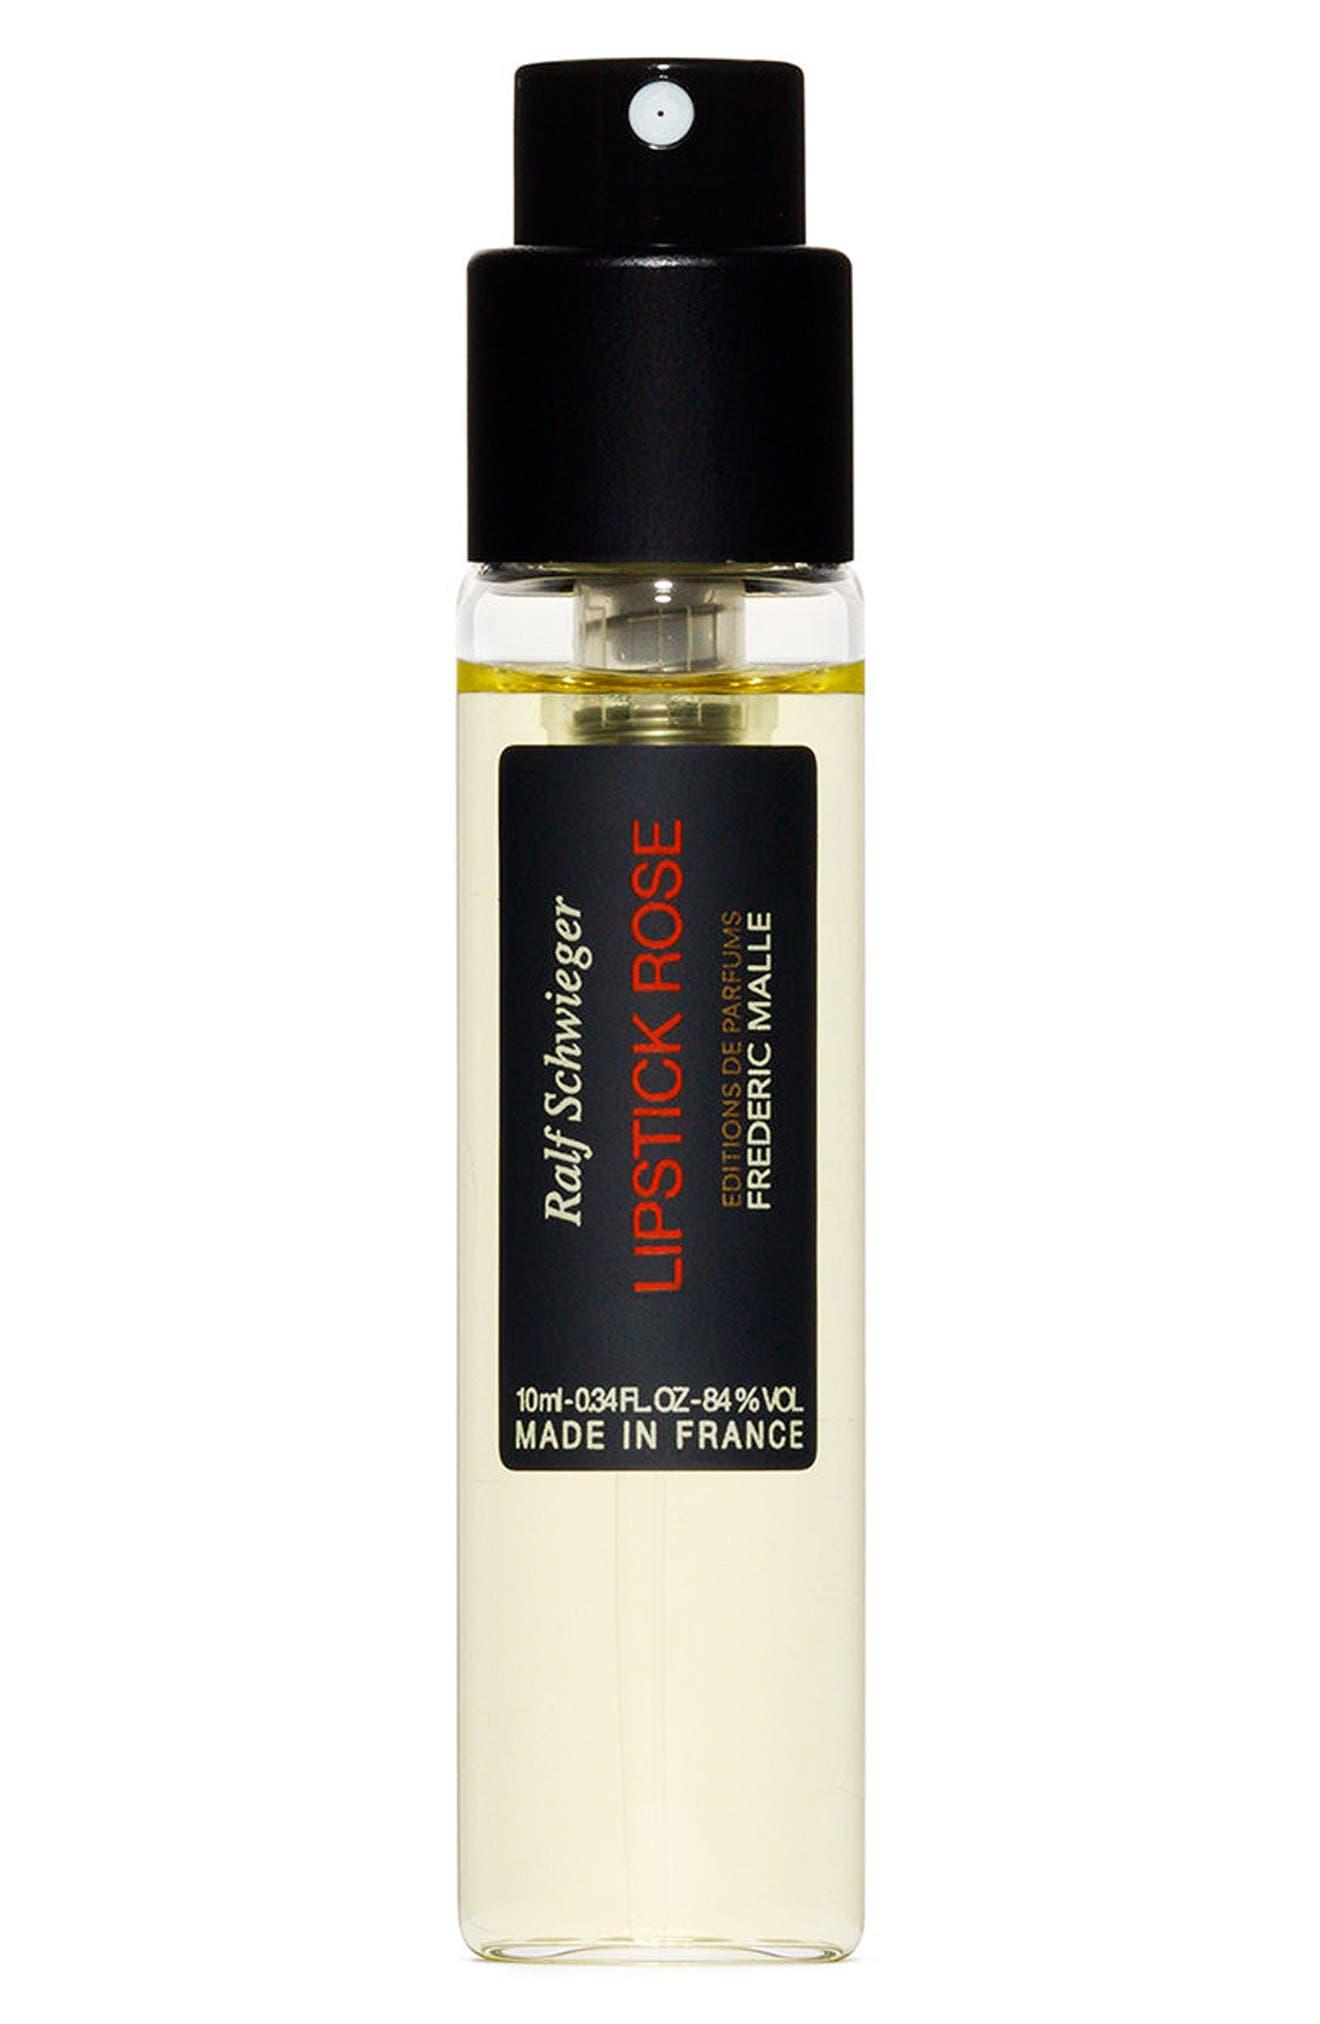 Editions de Parfums Frédéric Malle Lipstick Rose Travel Fragrance Spray,                             Main thumbnail 1, color,                             No Color